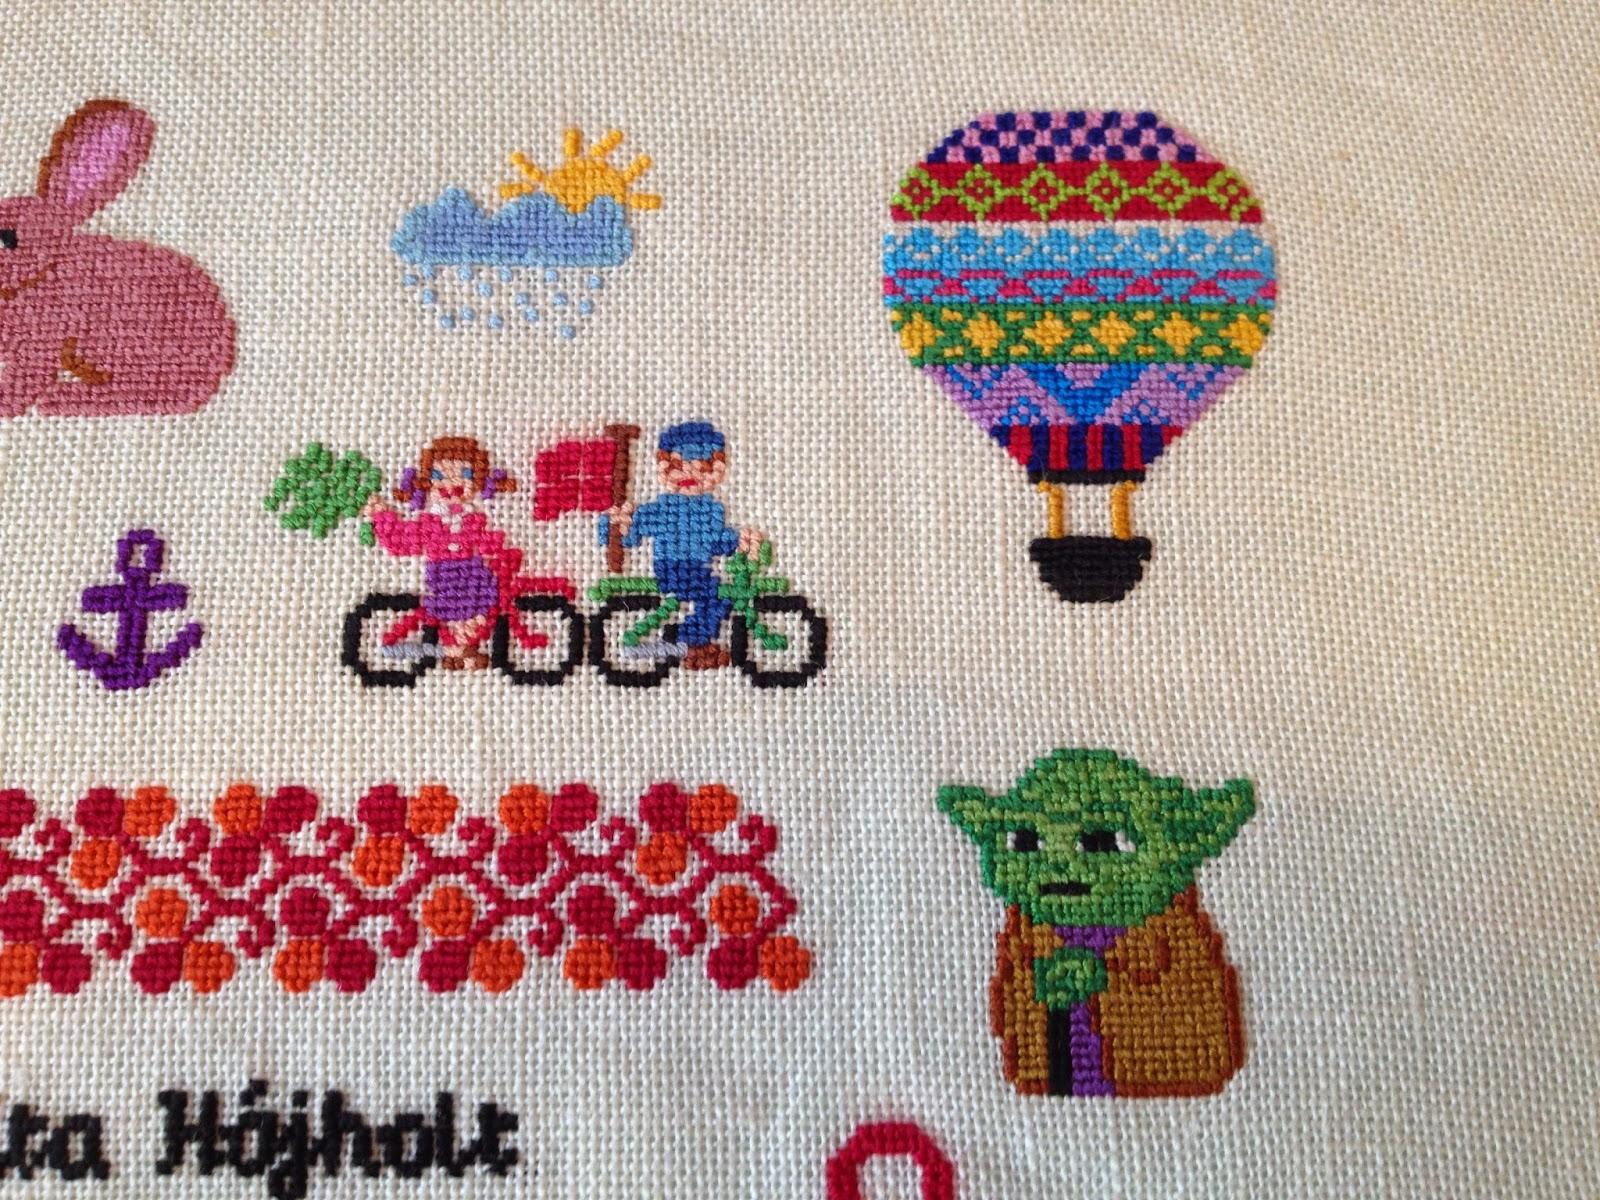 Luftballon, Yoda, cyklister, regnsky. Navnebroderi i korssting. Navneklud. Fødselsbroderi.